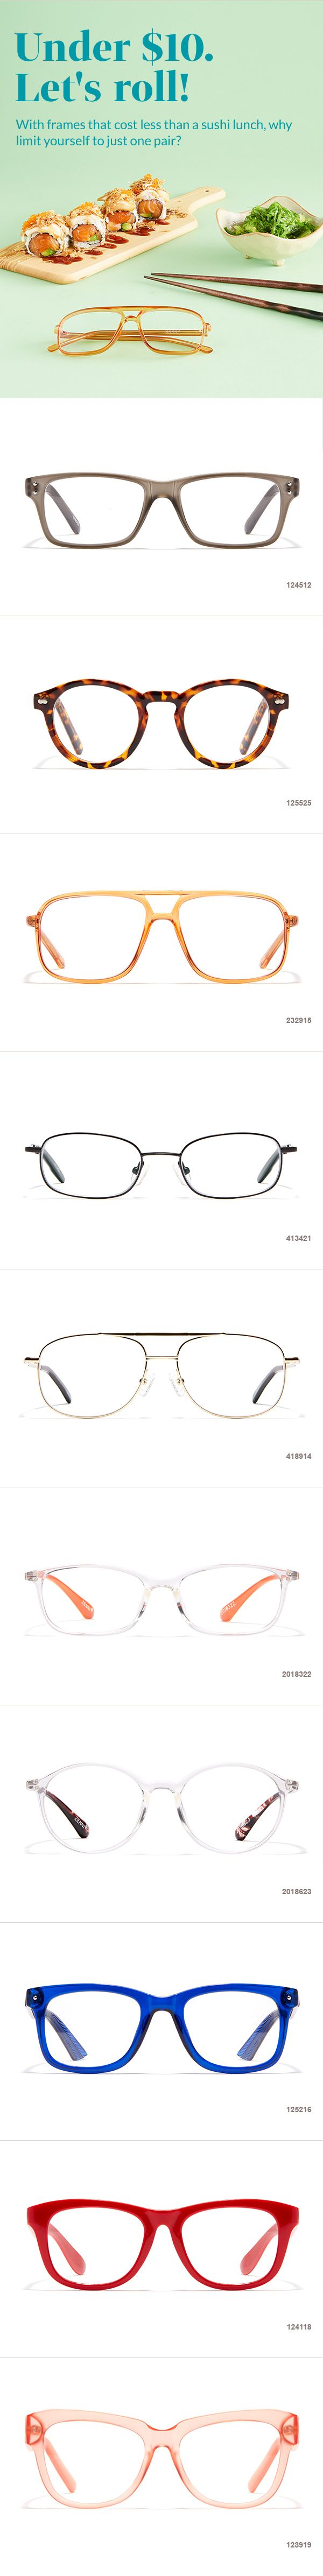 Stylish frames under $10. Let's roll!